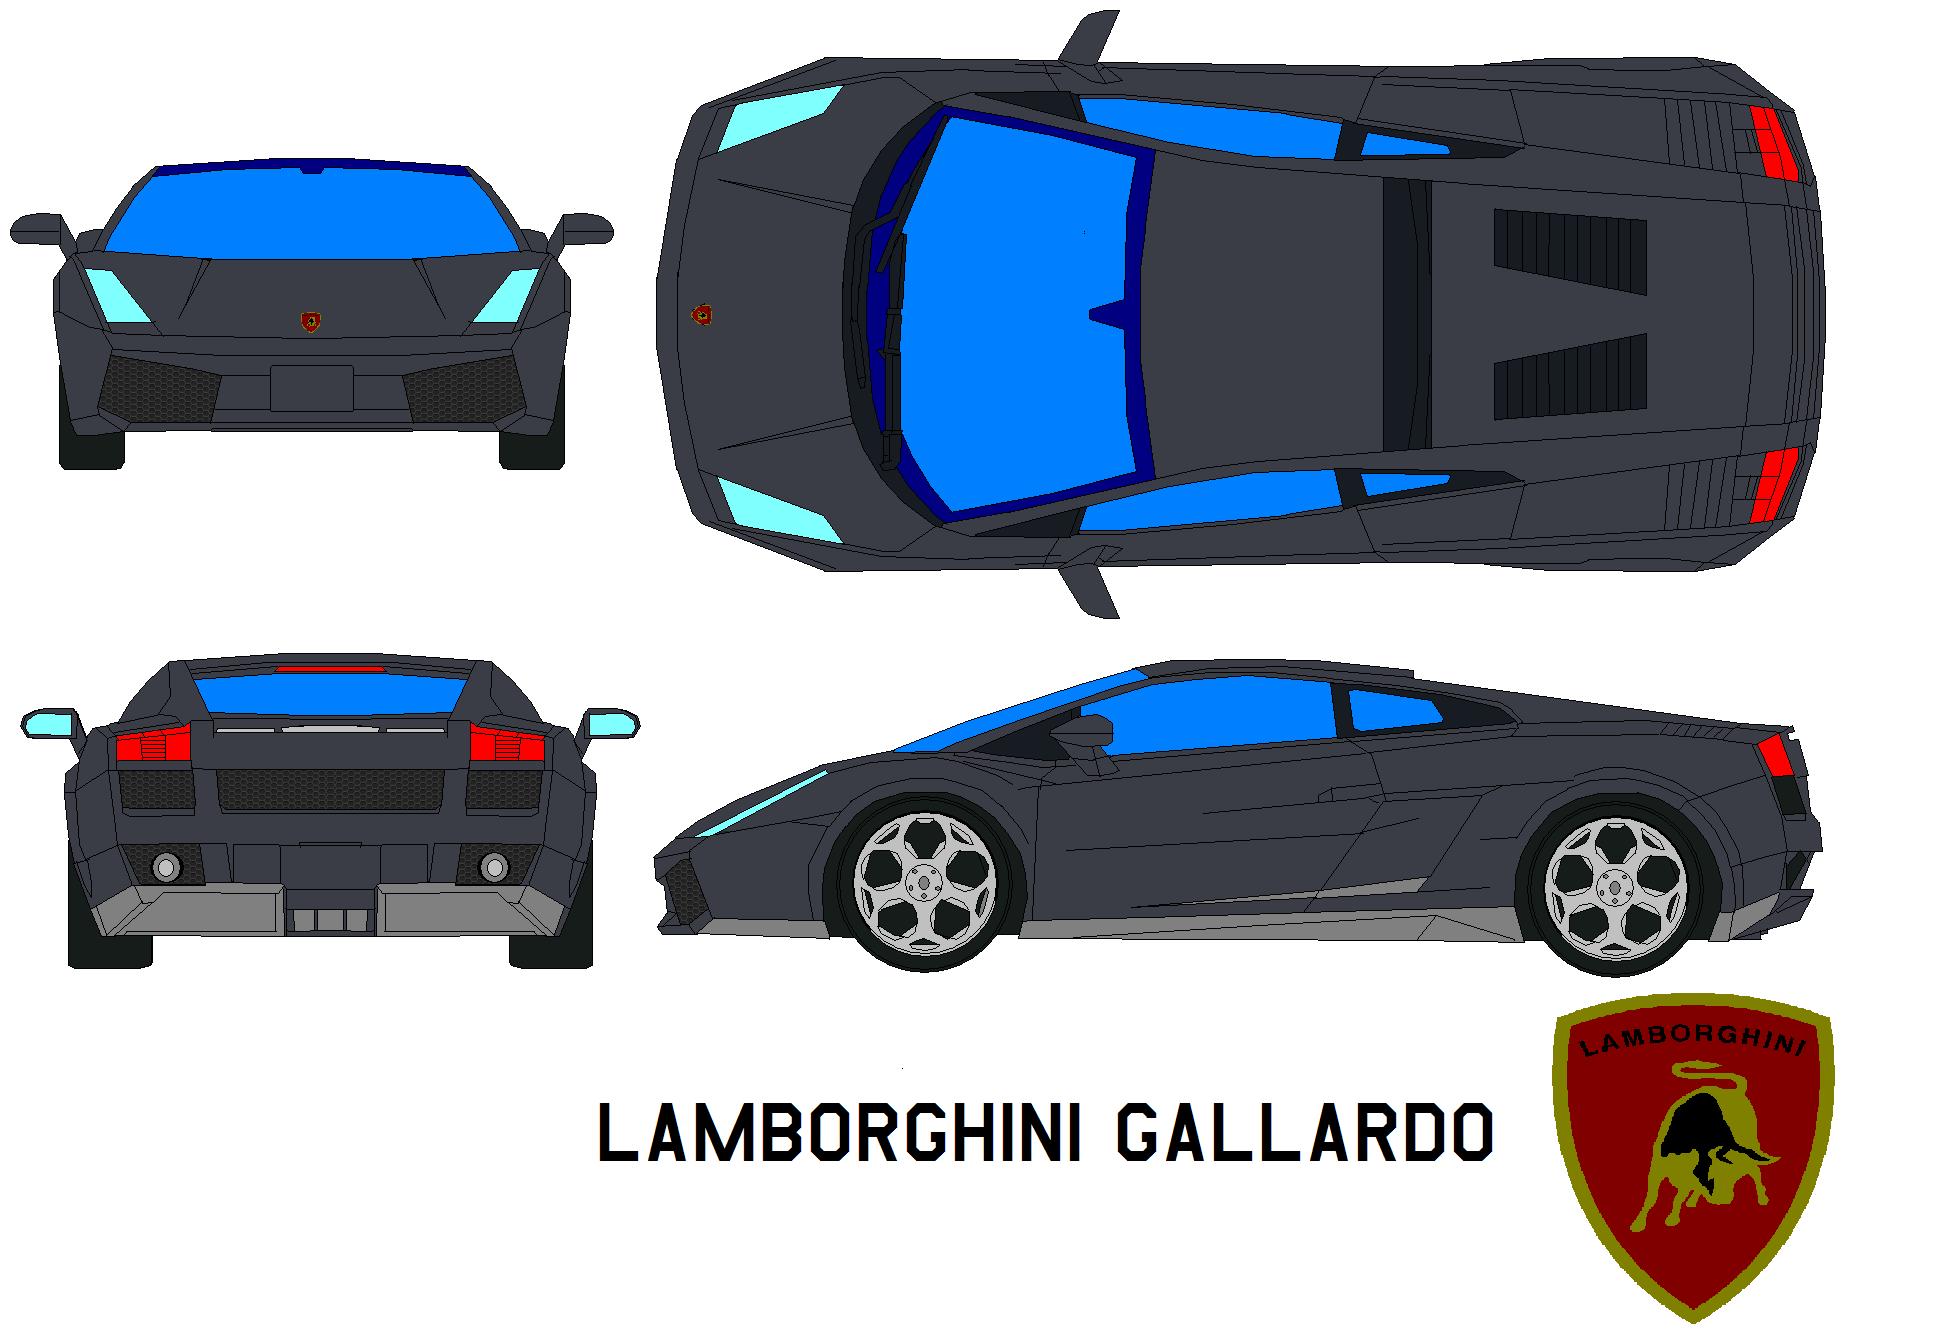 Lamborghini Gallardo Sports Car Vorsteiner White